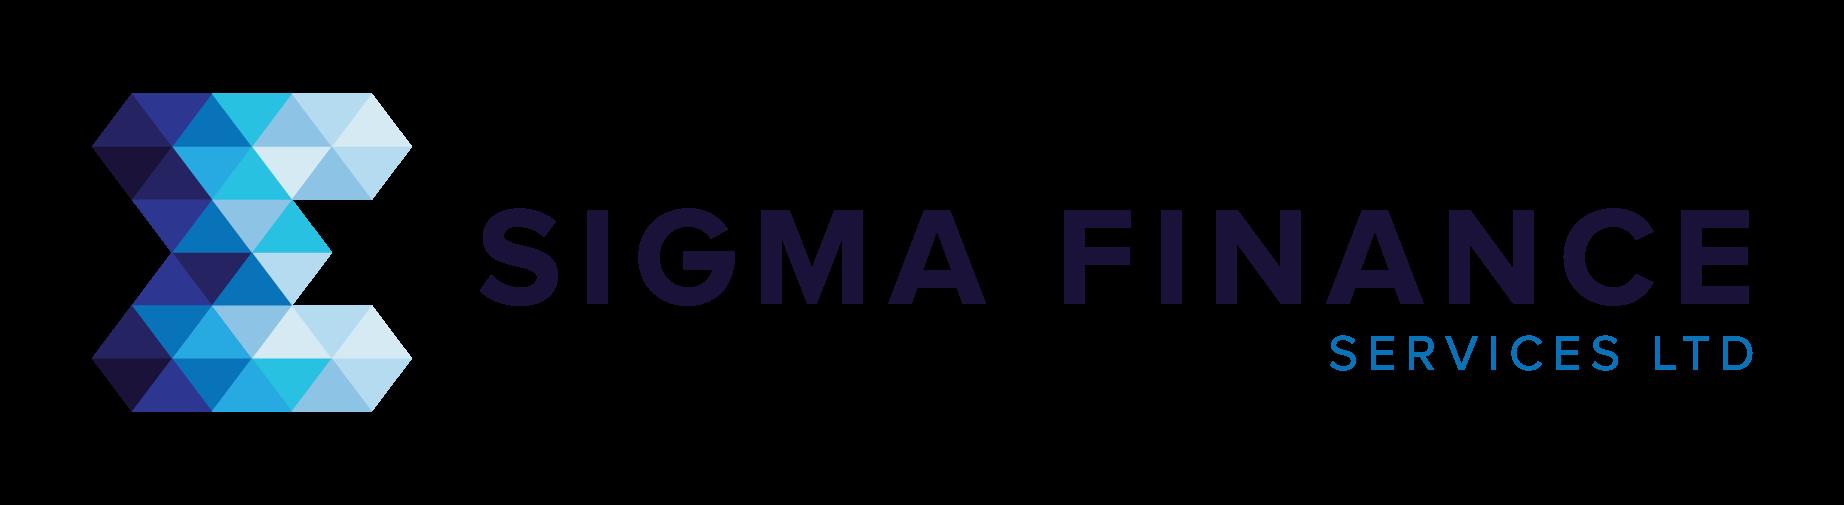 Sigma Finance